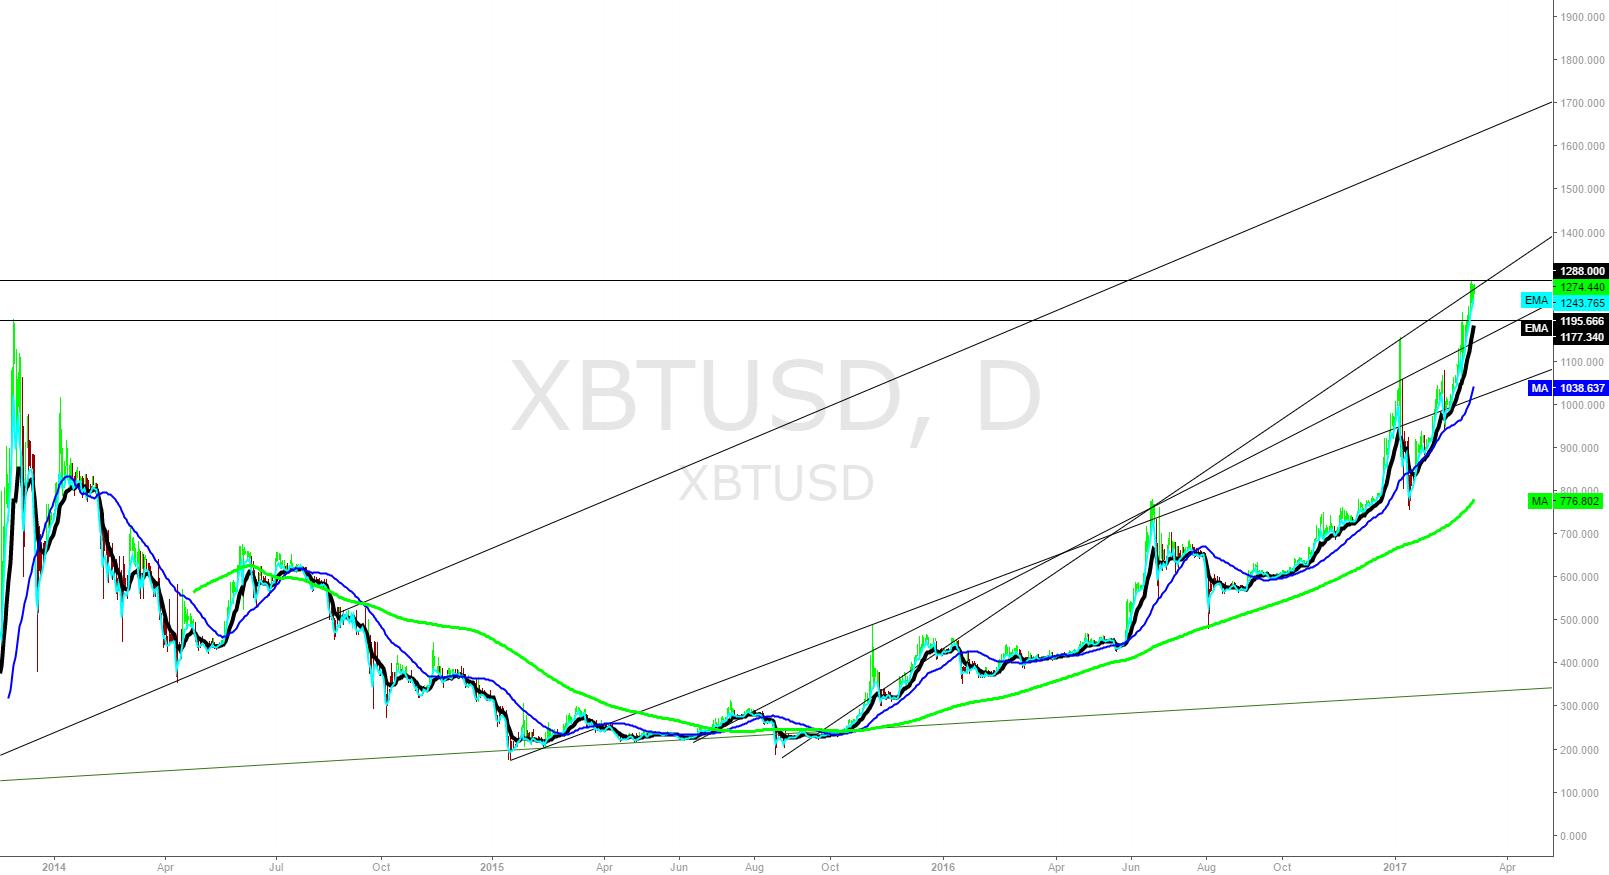 XBTUSD Daily Trend